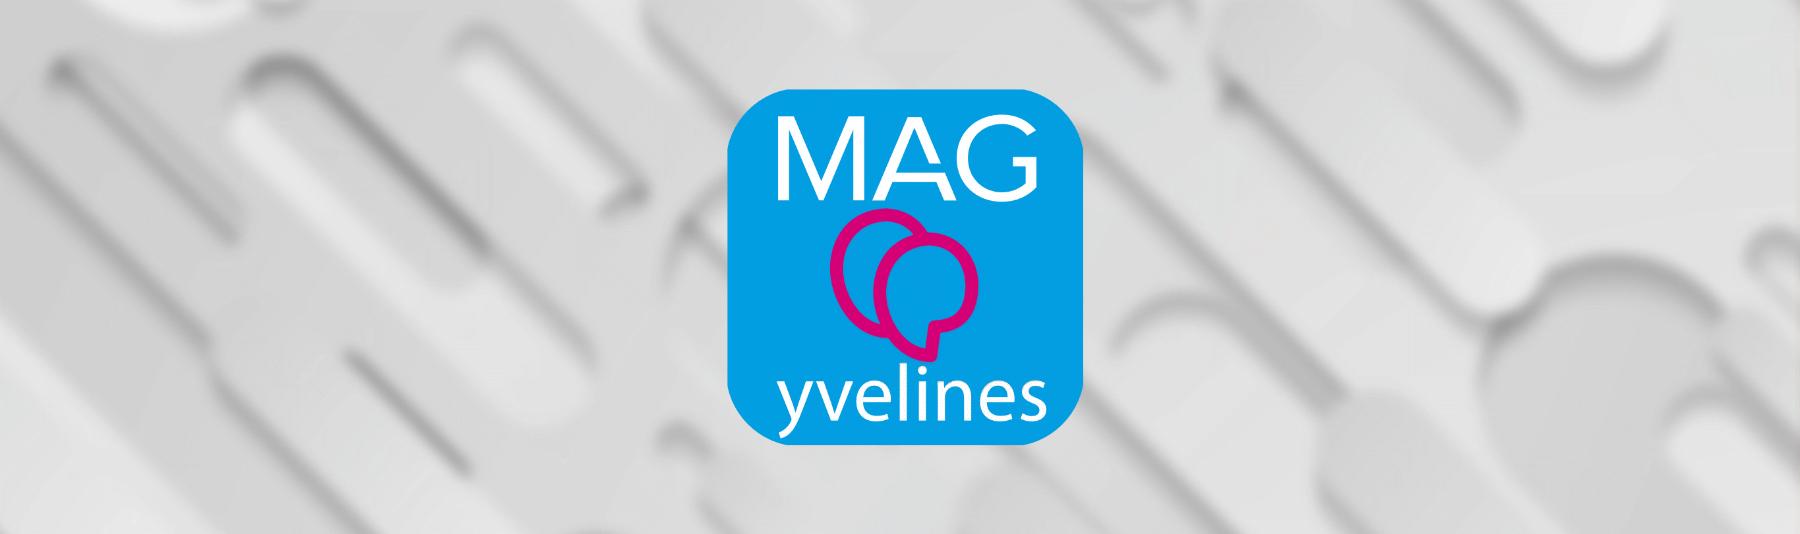 Le Mag Yvelines